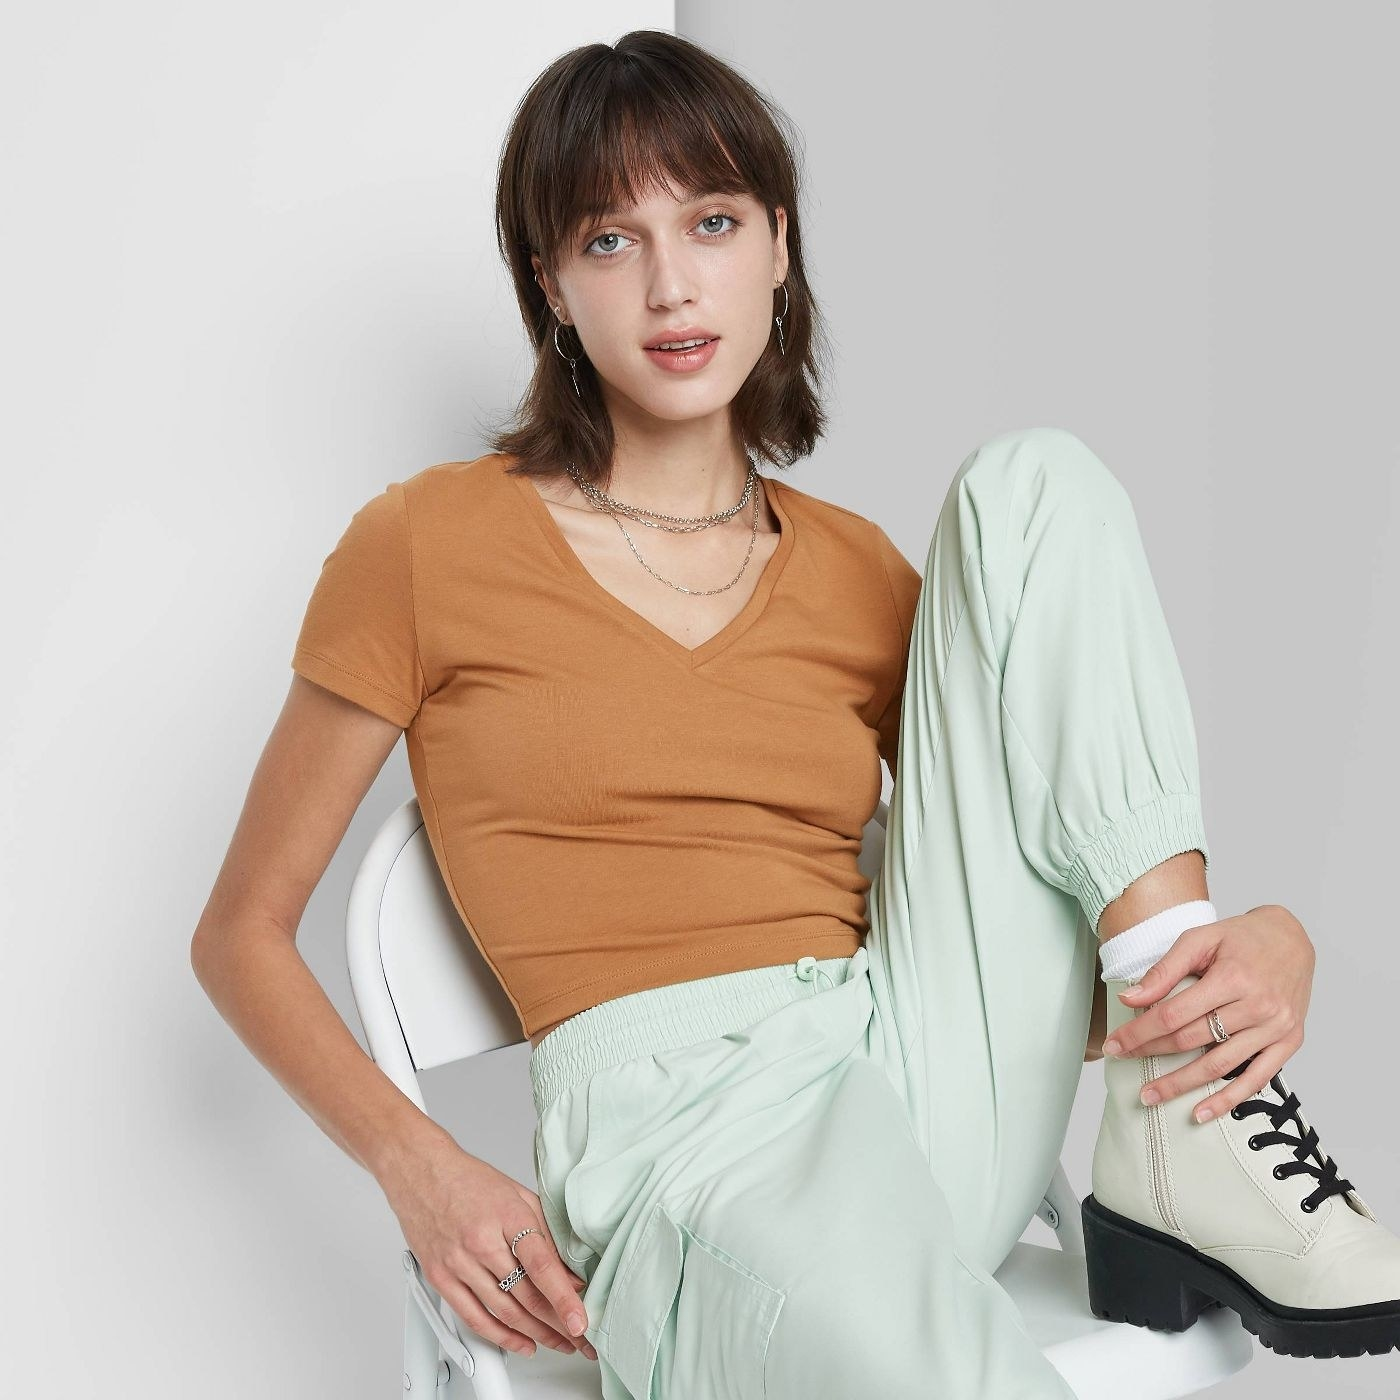 Model wearing mustard yellow shirt, stops at the waist